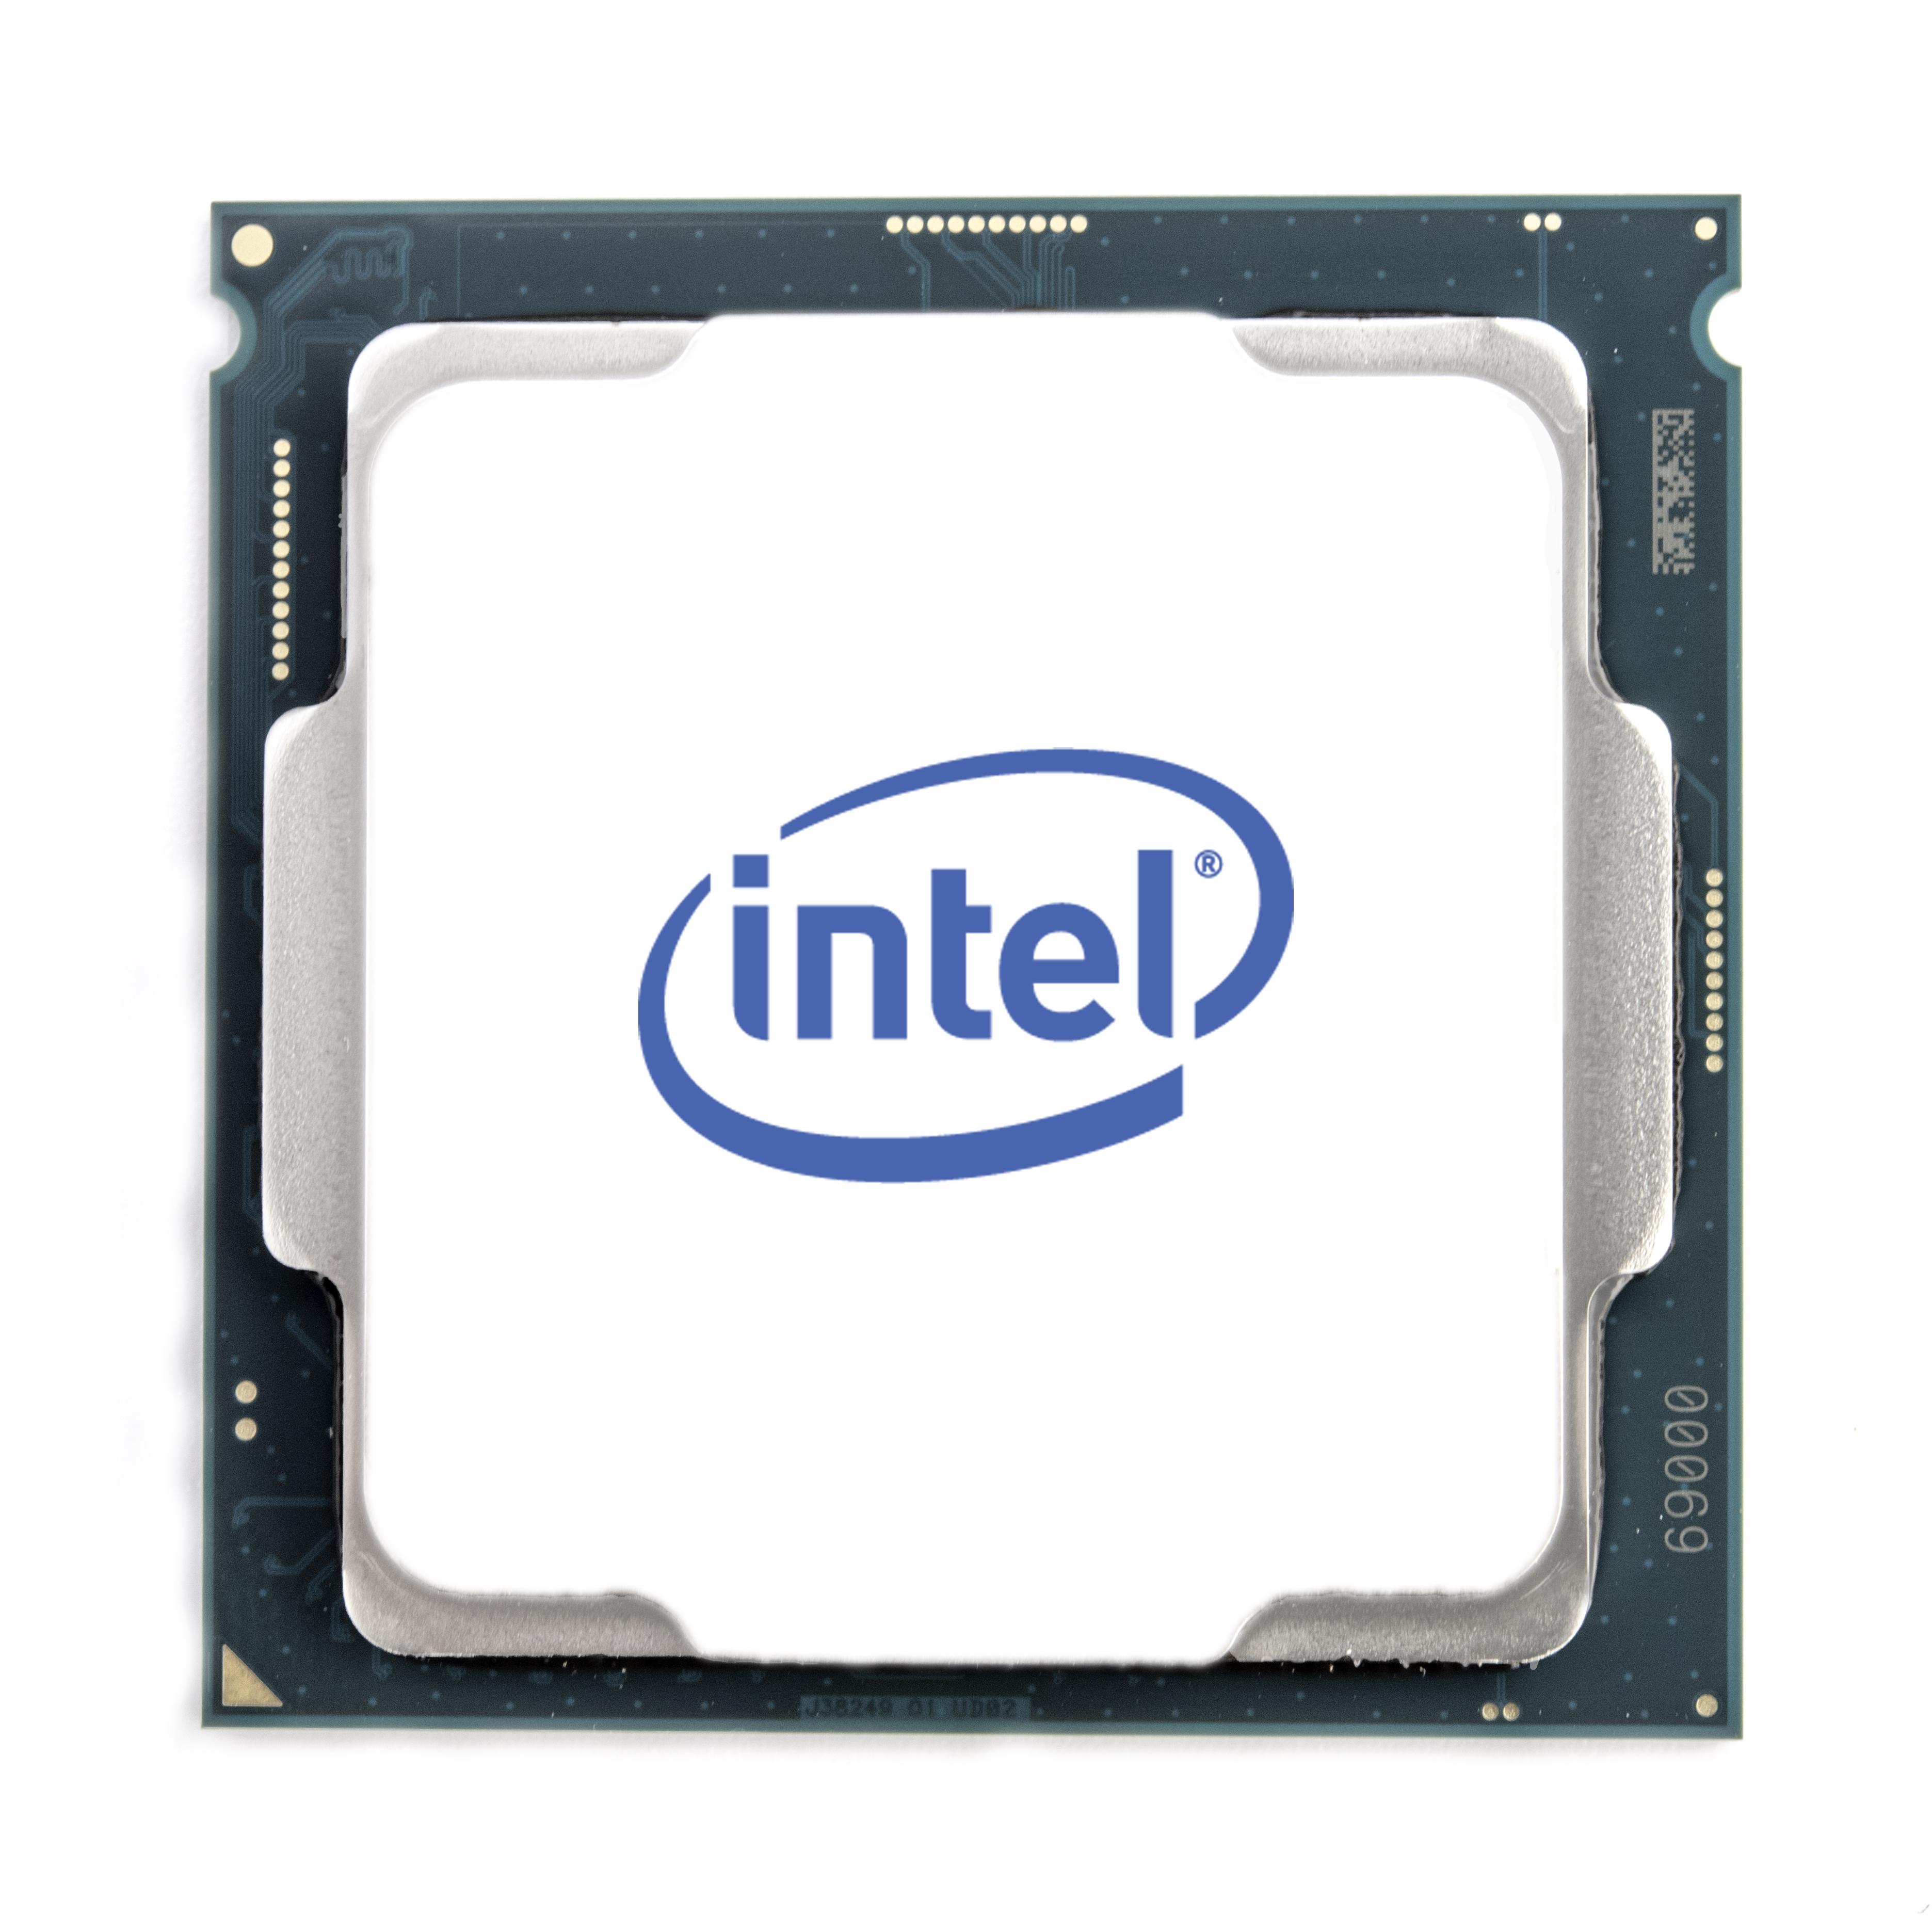 Intel Core i3-10100F Core i3 3,6 GHz - Sockel 1-3 Comet Lake